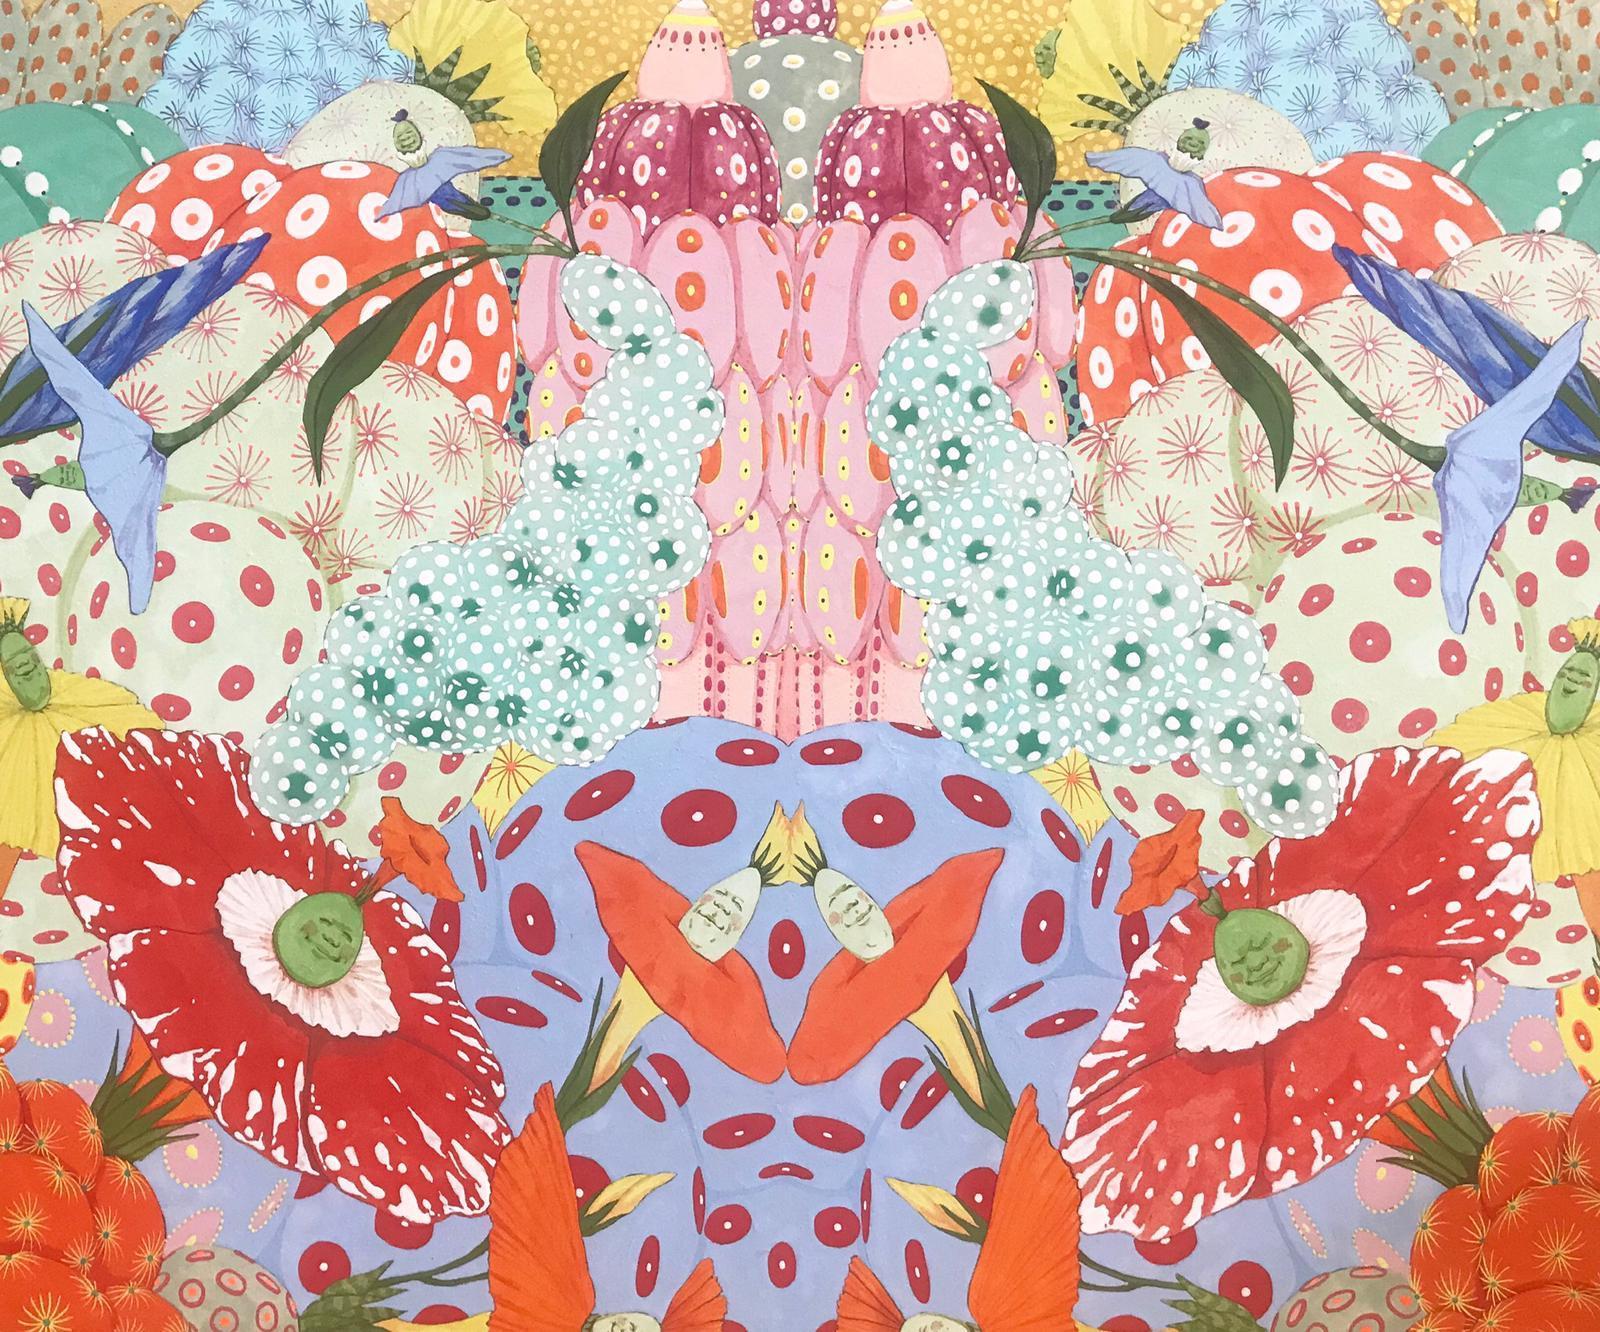 Ritmo de alegria - 21st Century, Contemporary, Figurative Painting, Japanese Art